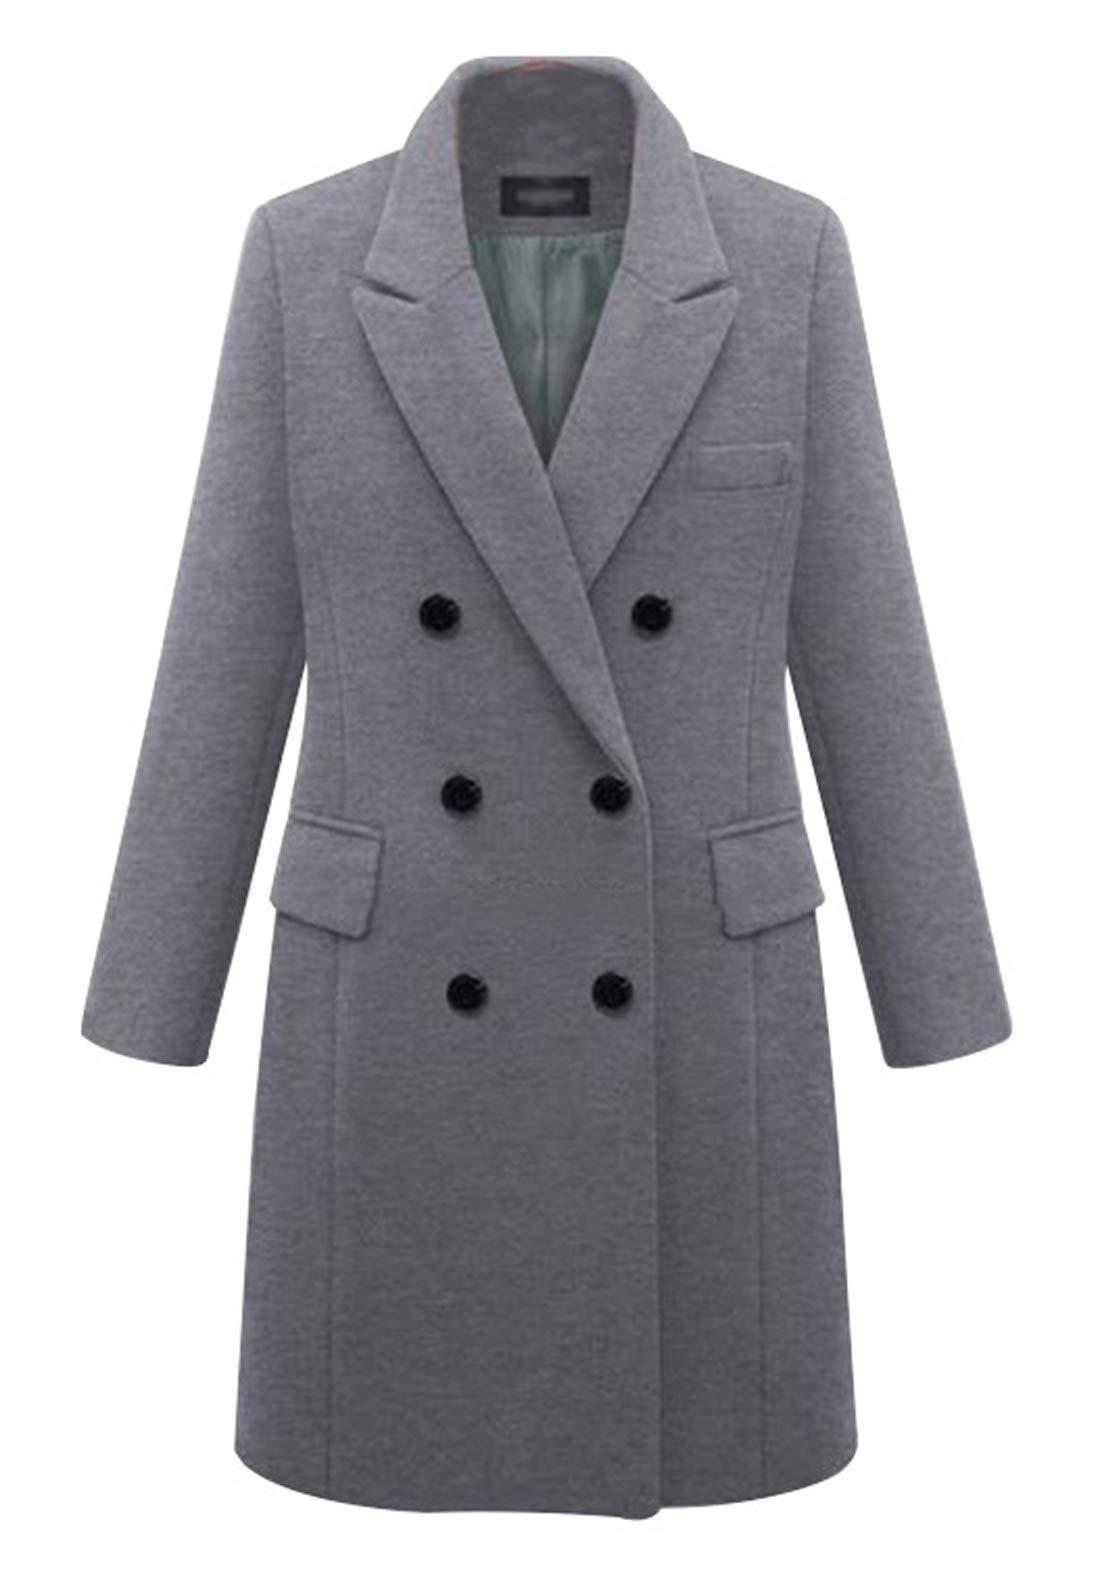 chouyatou Women's Basic Designed Notch Lapel Double Breasted Mid-Long Wool Pea Coat (Large, Grey) by chouyatou